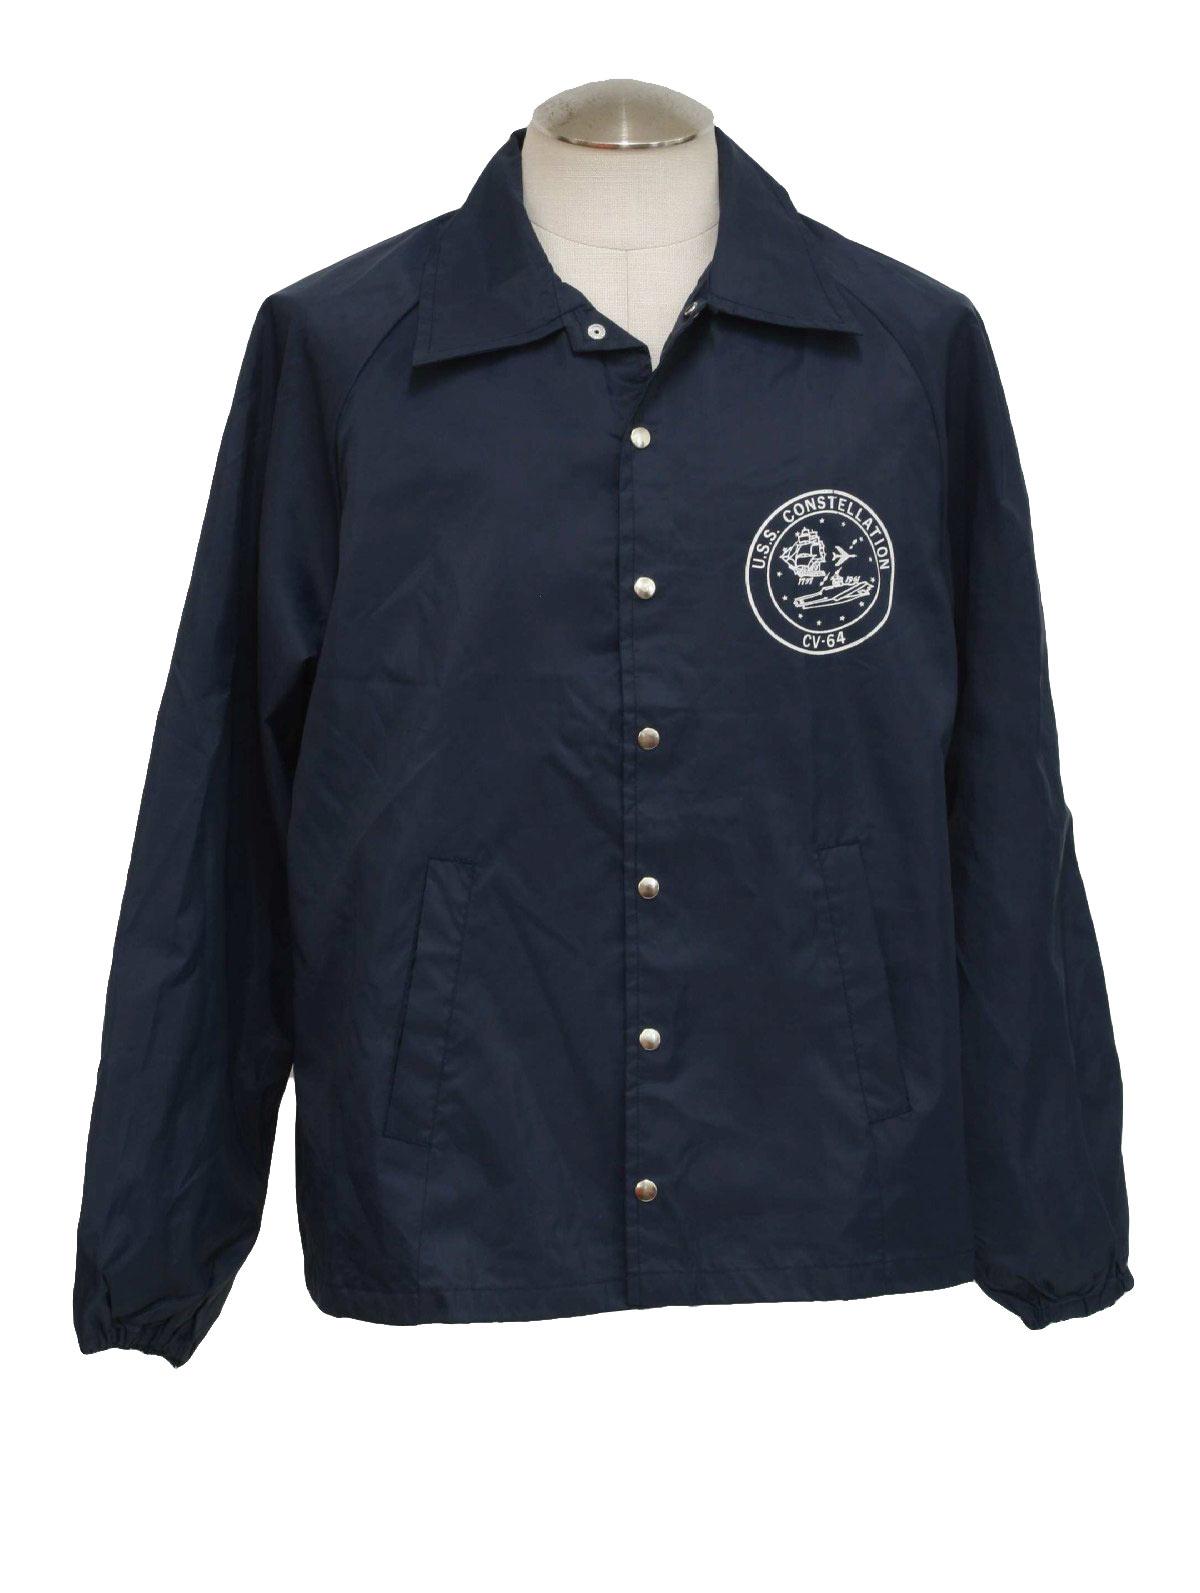 Seventies Care Label Jacket: 70s -Care Label- Mens dark blue nylon